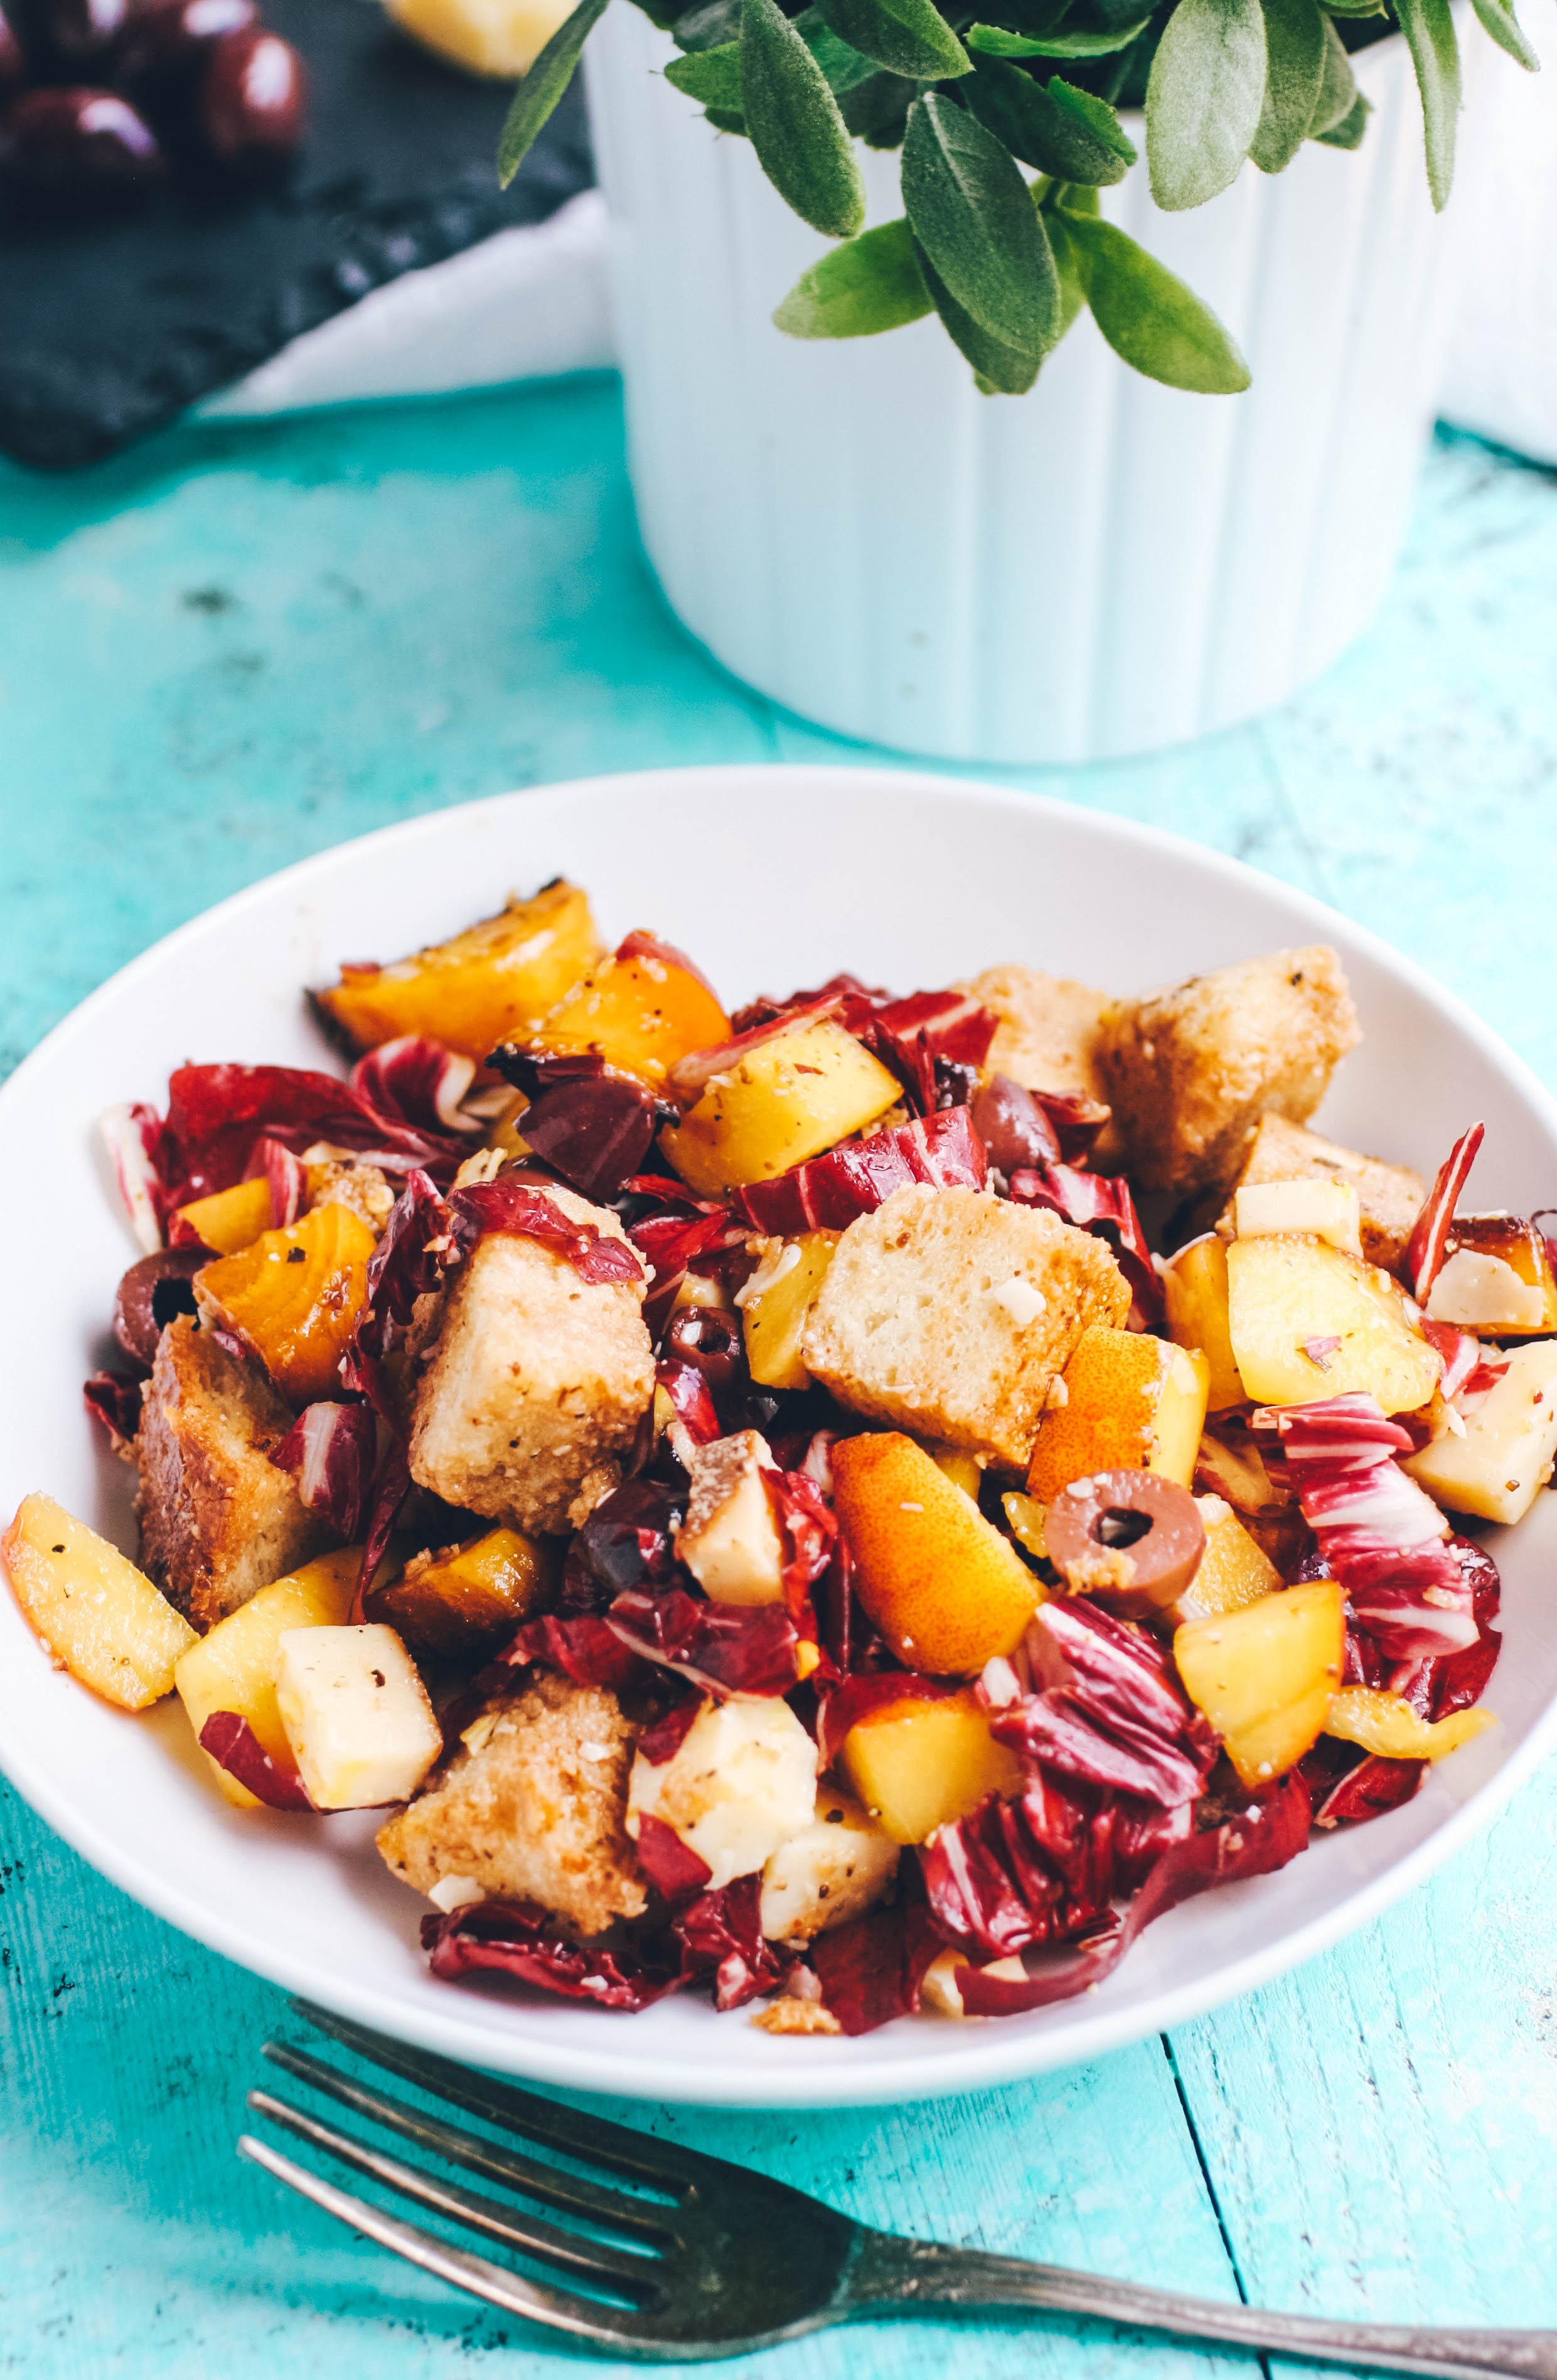 Roasted Beet, Peach & Radicchio Panzanella Salad is an amazing summer meal. You'll enjoy the big flavors and colors in Roasted Beet, Peach & Radicchio Panzanella Salad.